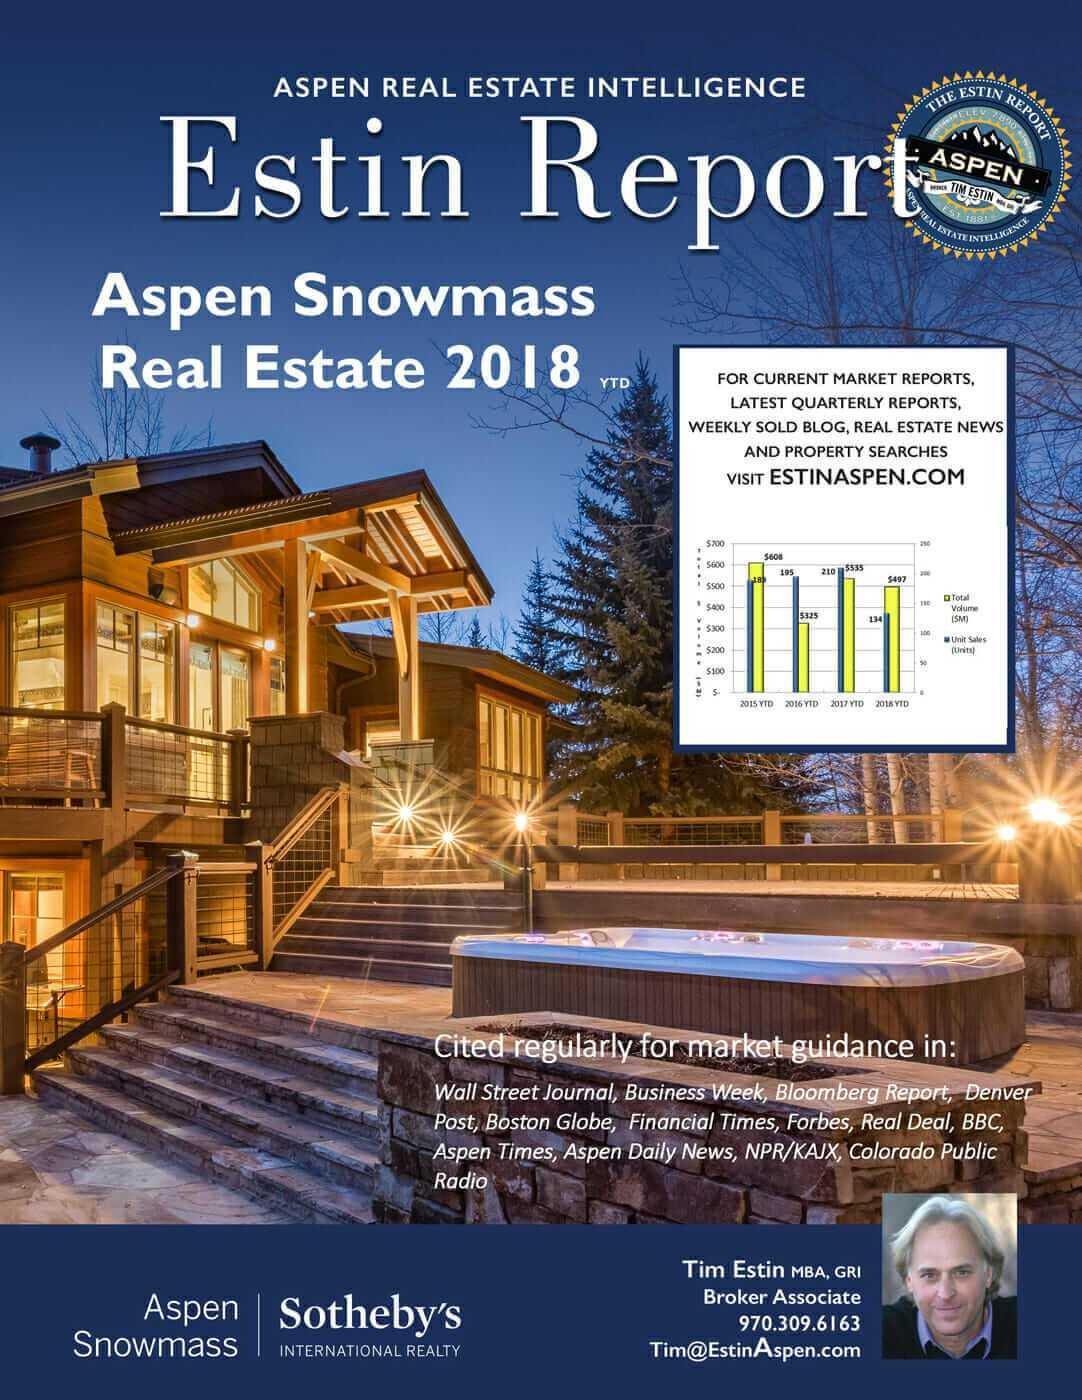 Estin Report: Aspen Snowmass Real Estate Market 2018 YTD and 2017 YR Image